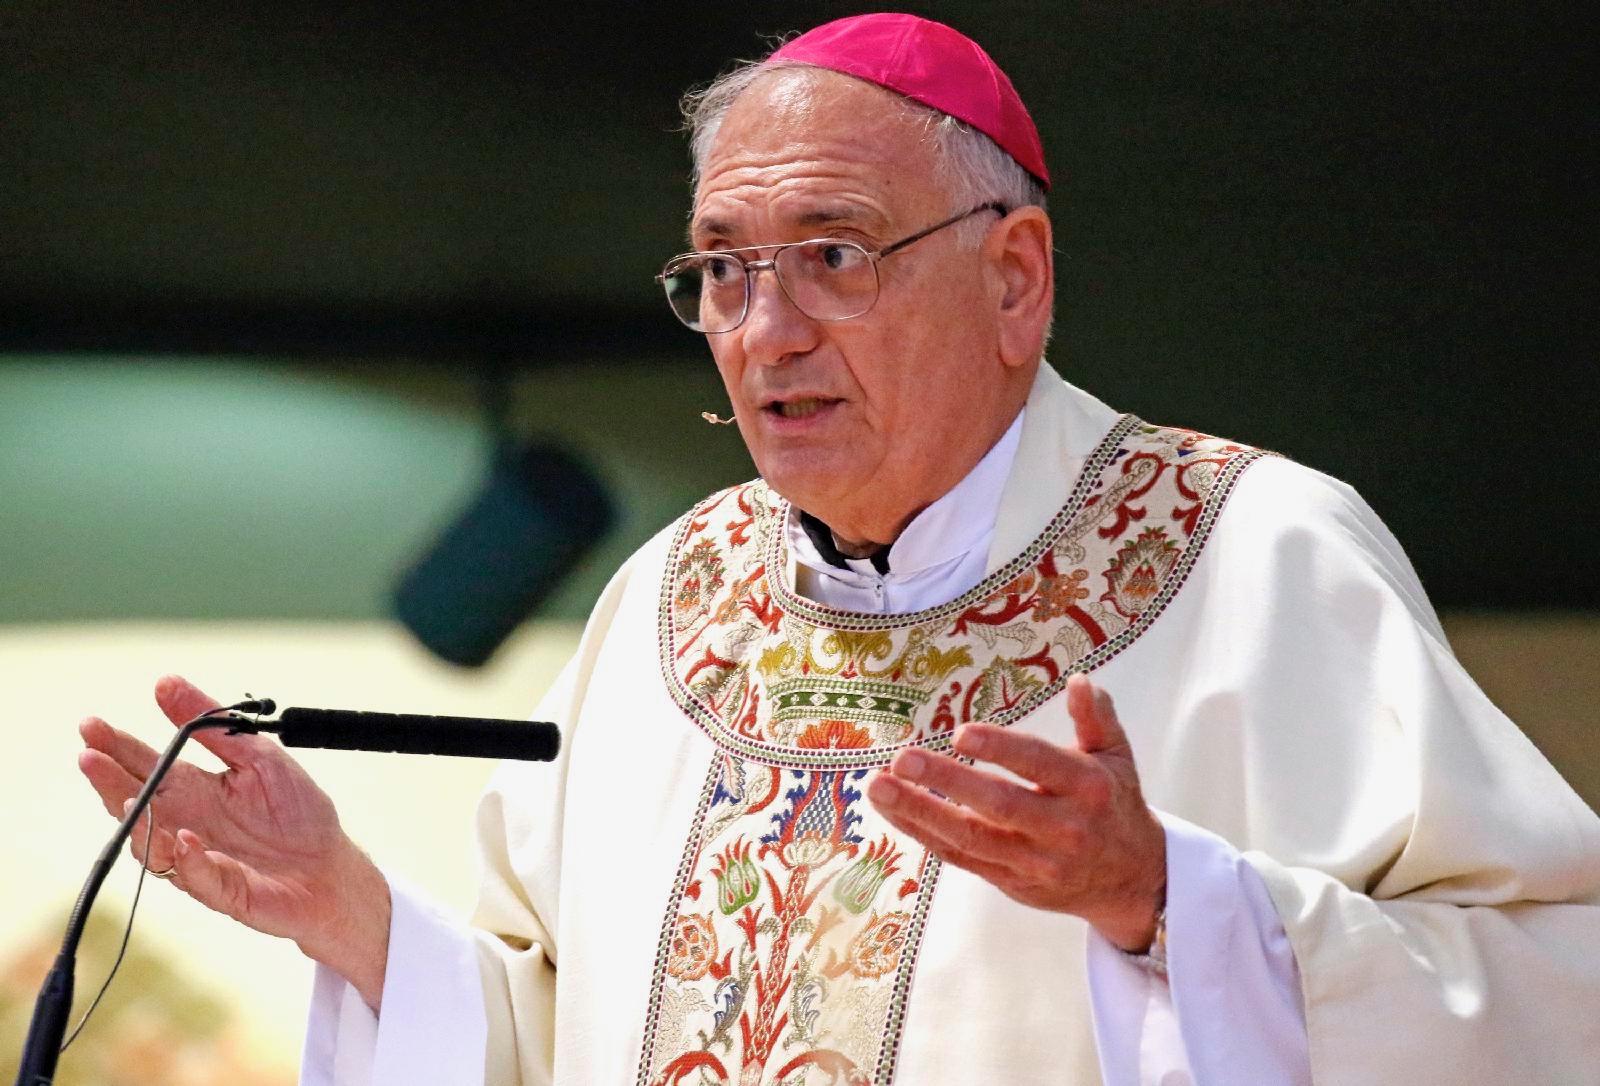 El obispo DiMarzio